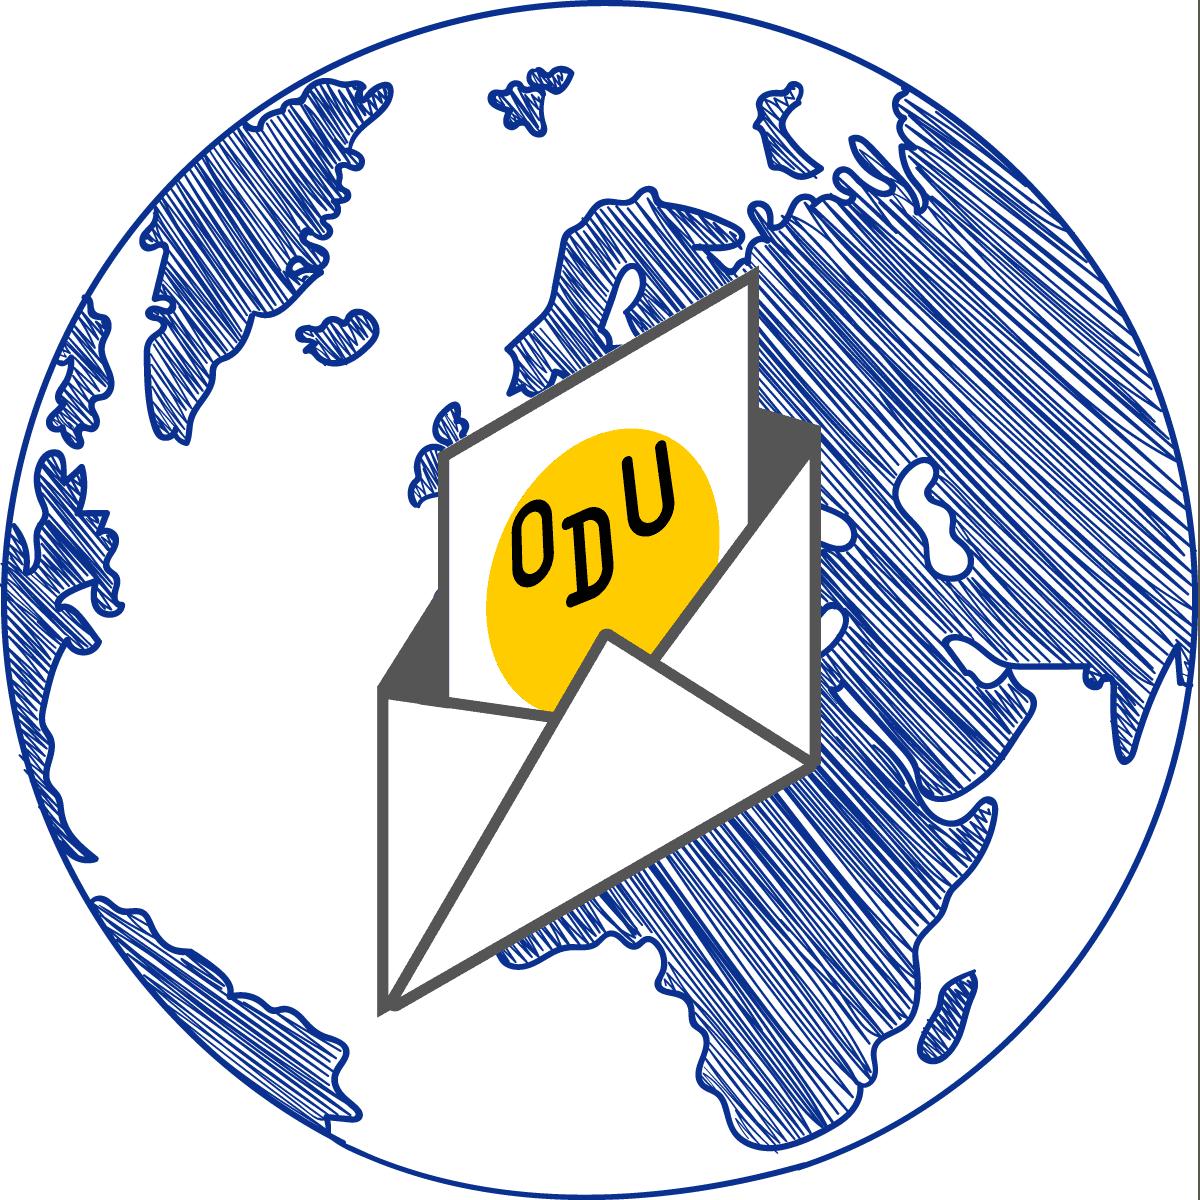 Supamodu message globe